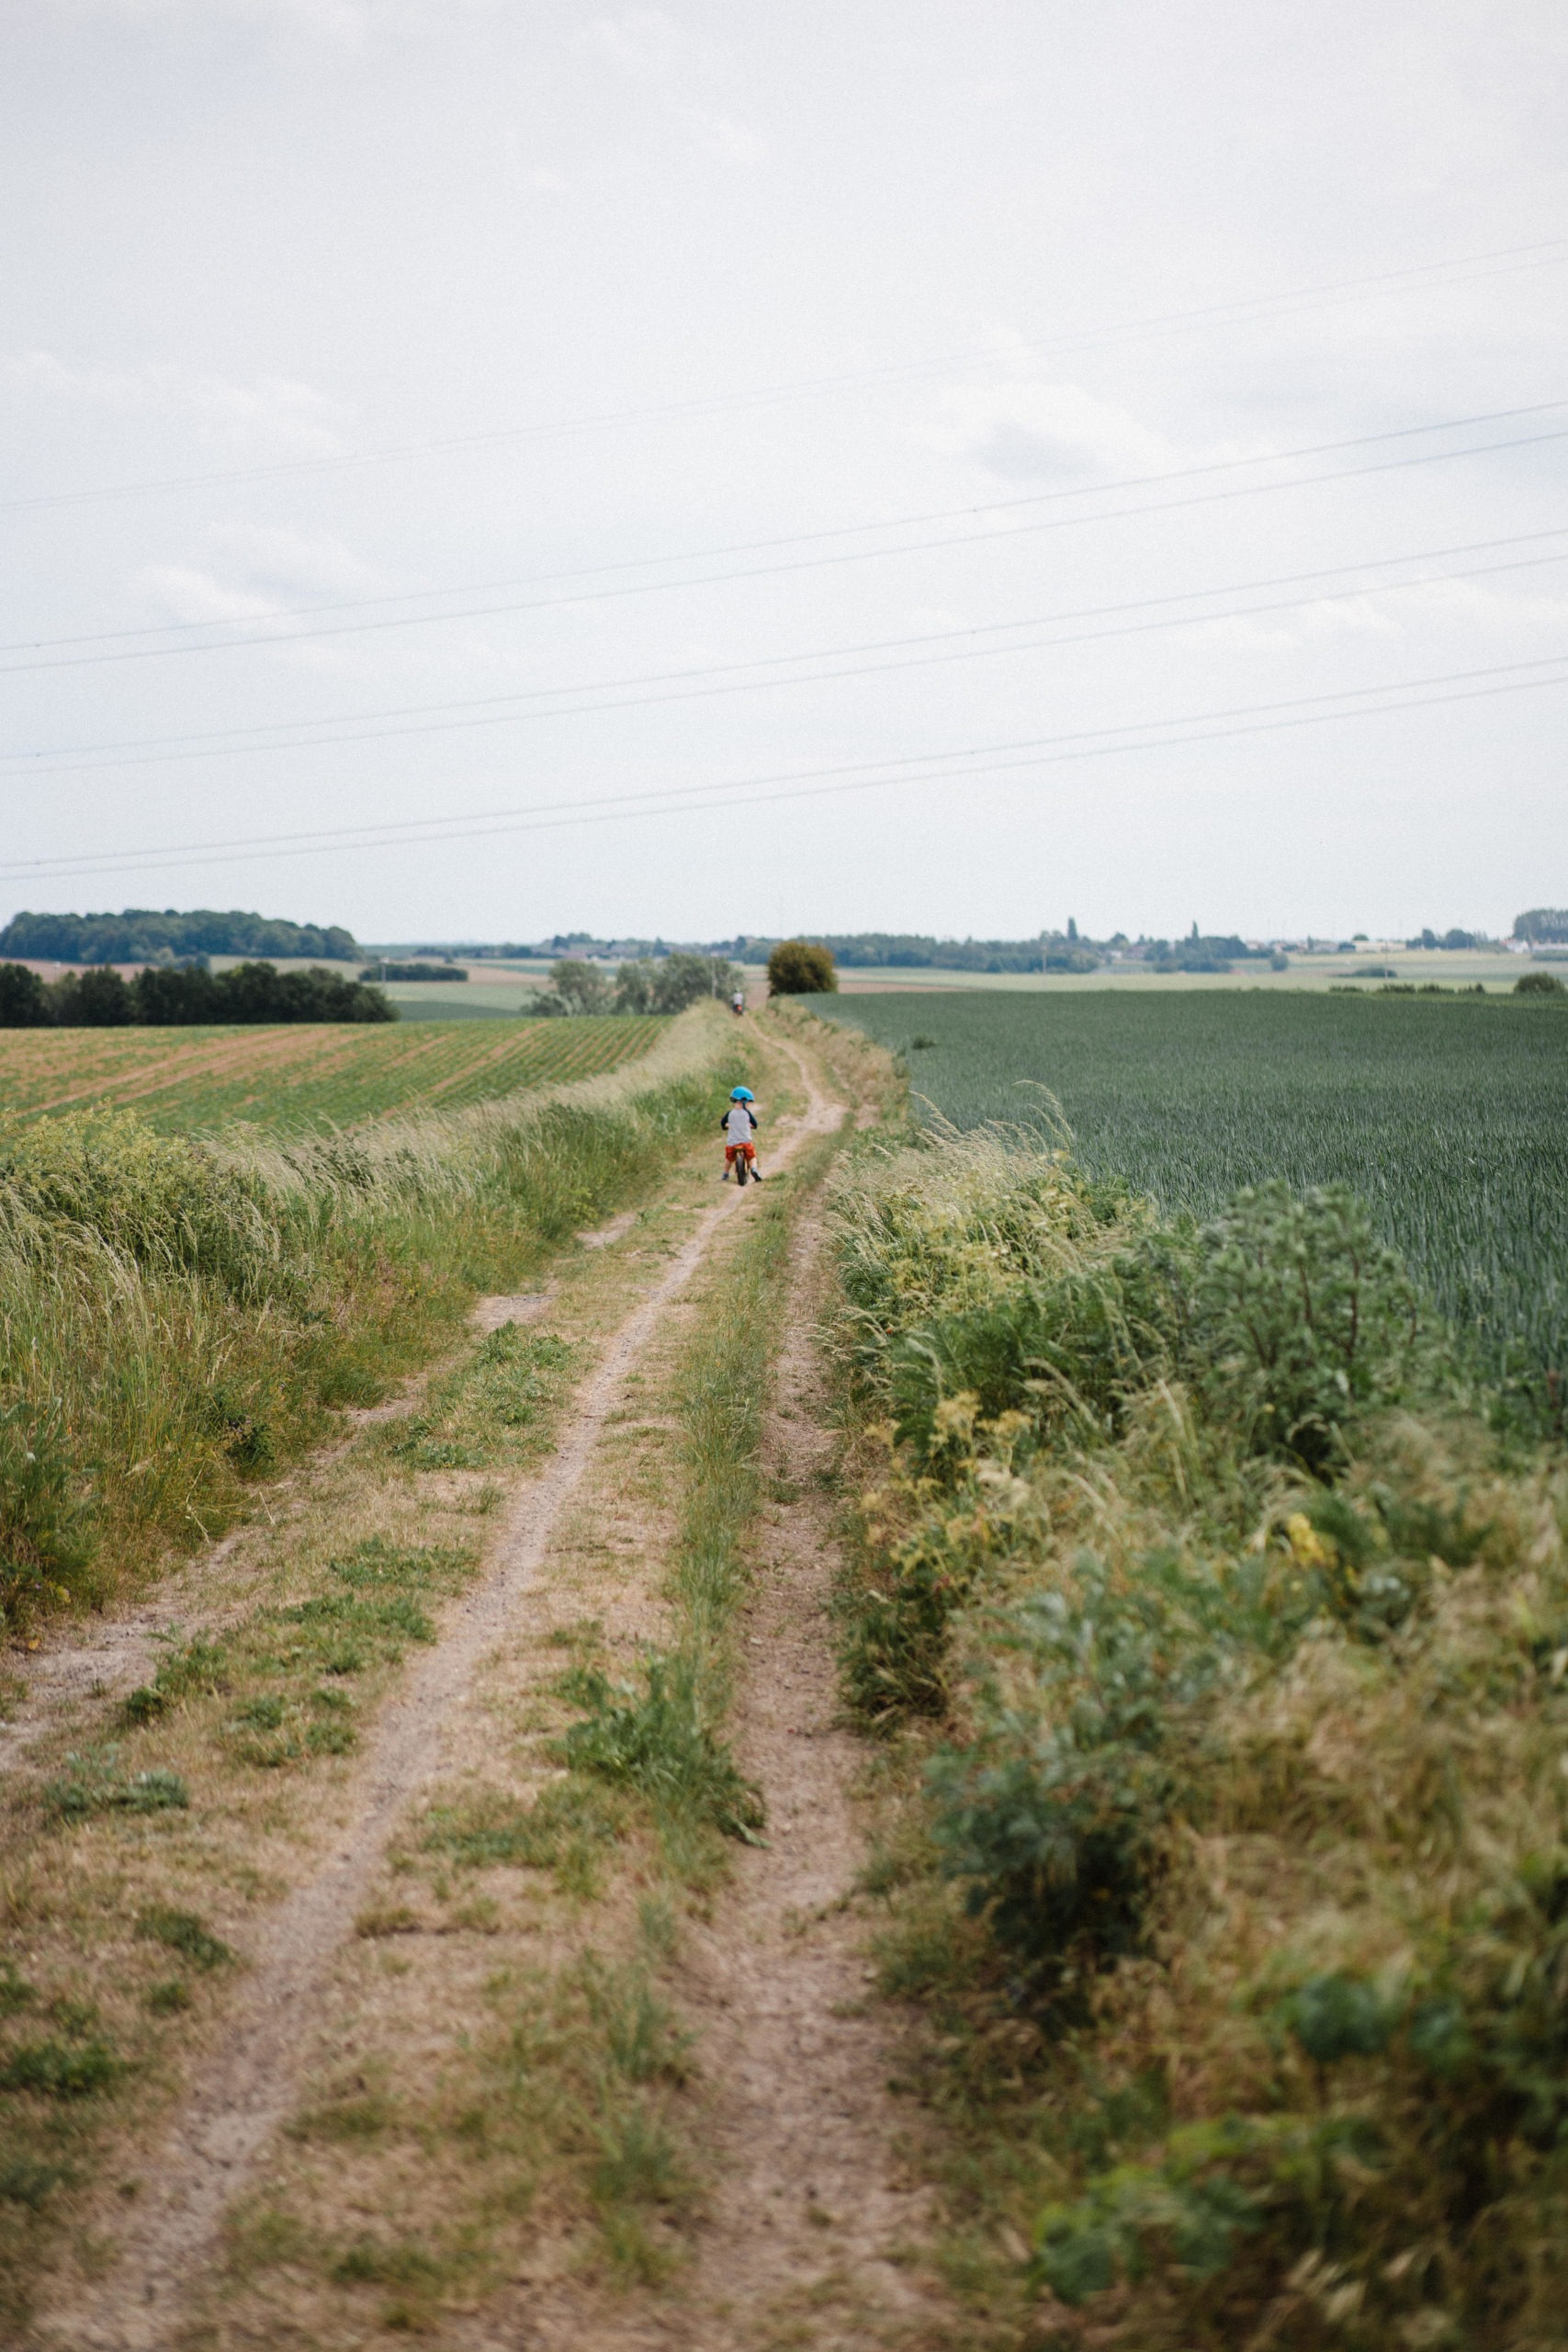 Promenade dans la campagne de Sombreffe 23